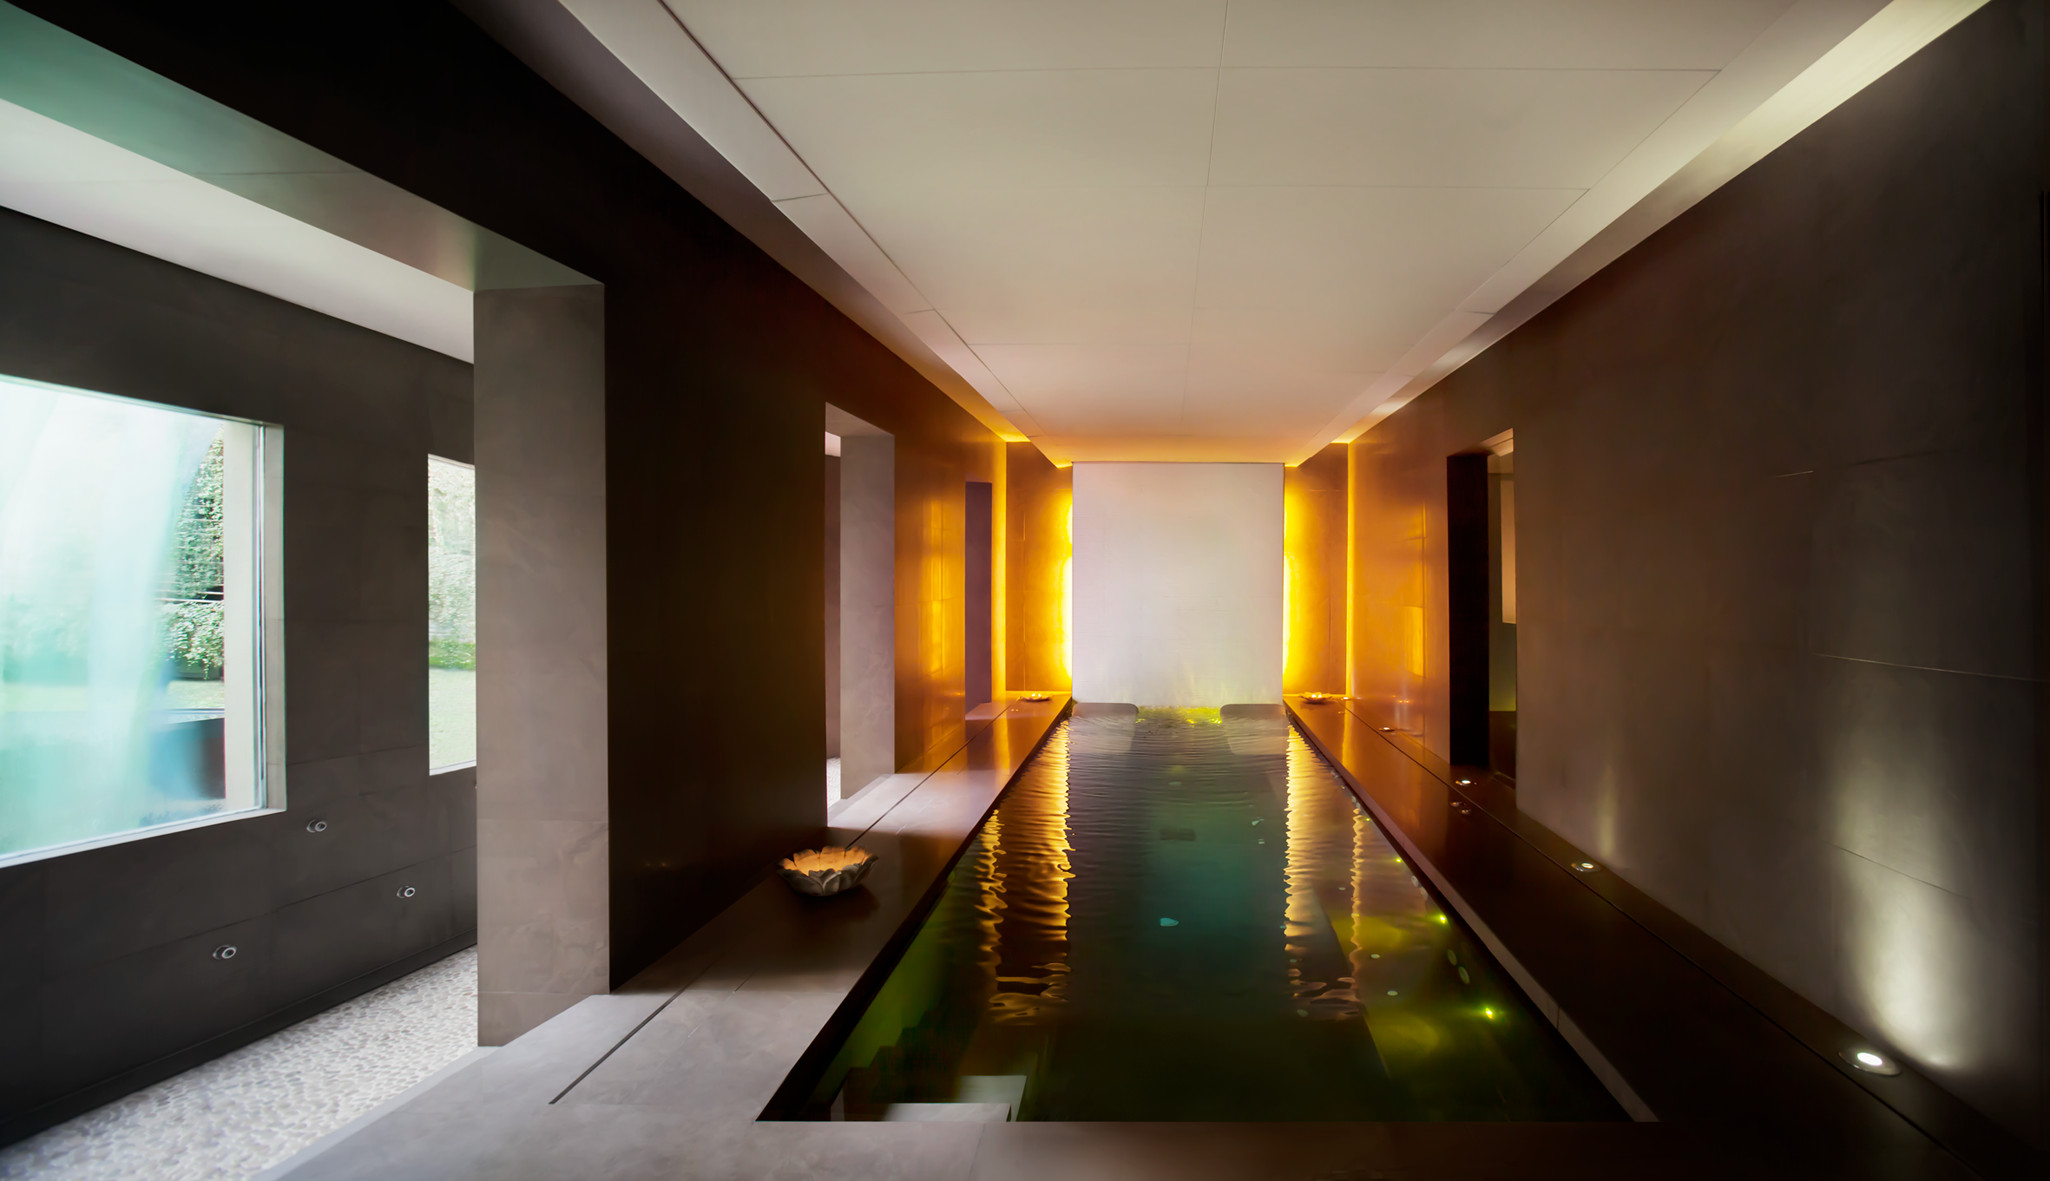 Barcelona 39 s most relaxing spas for Piscina barcelona